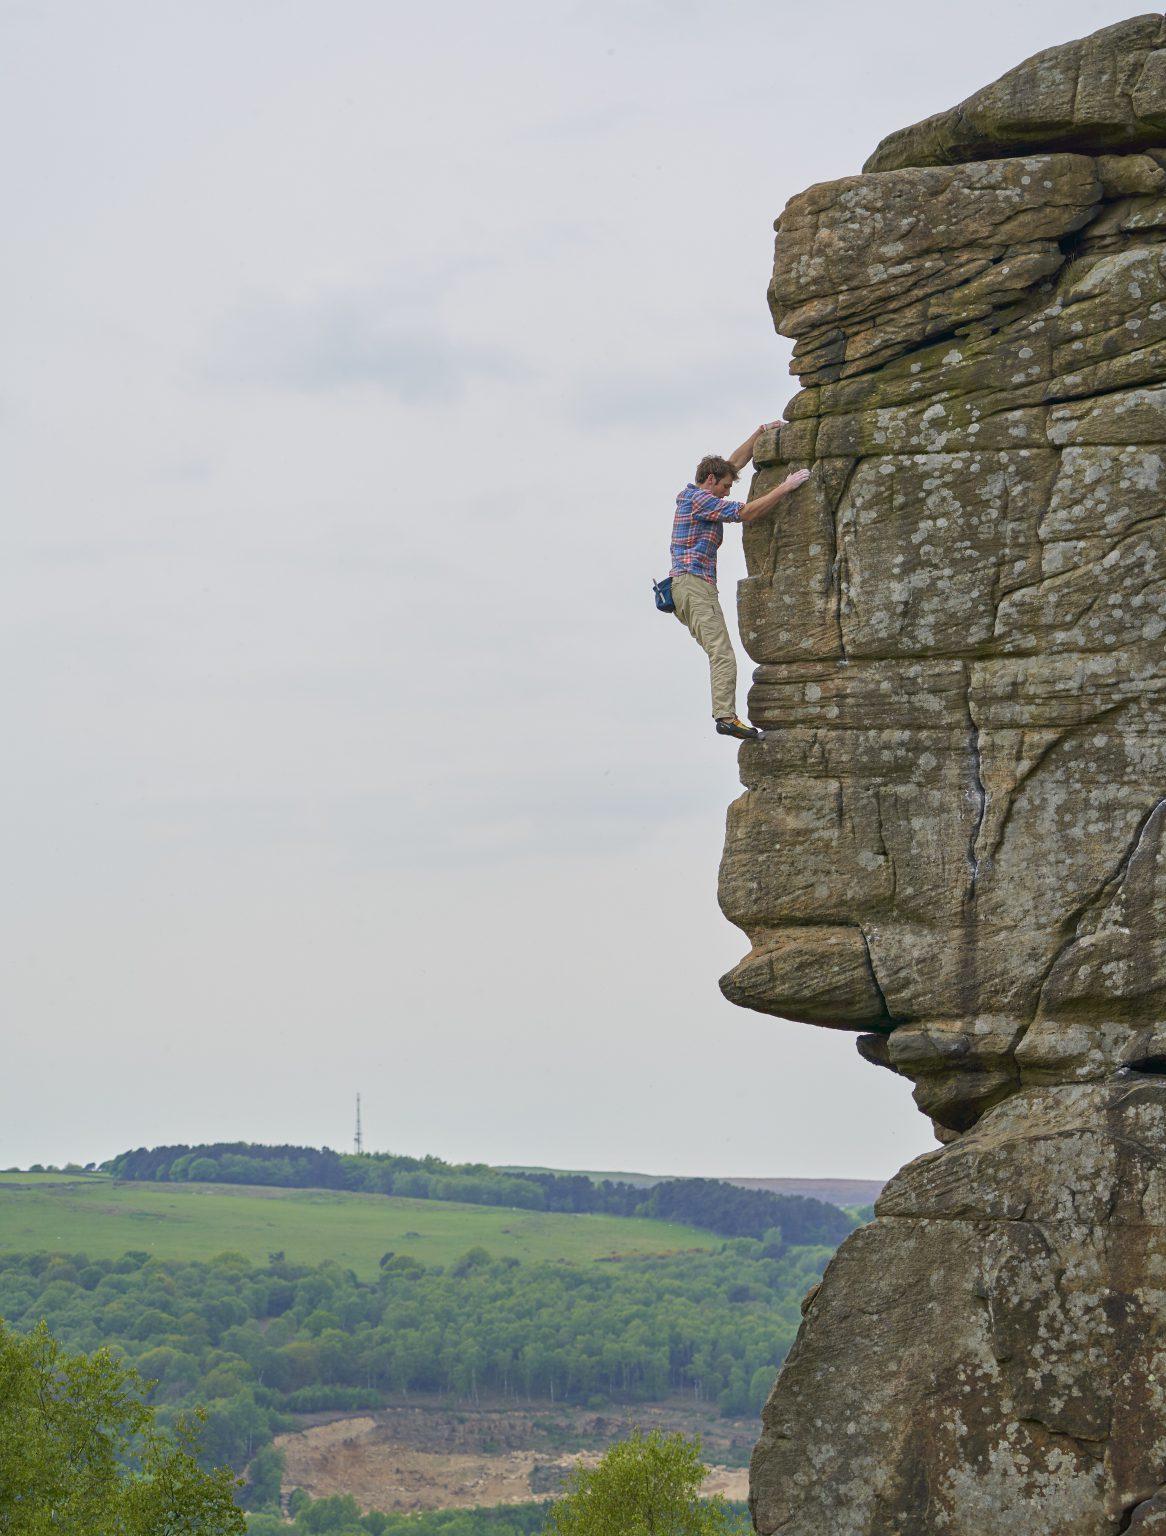 Robbie Phillips free solos at Froggatt, The Peak District